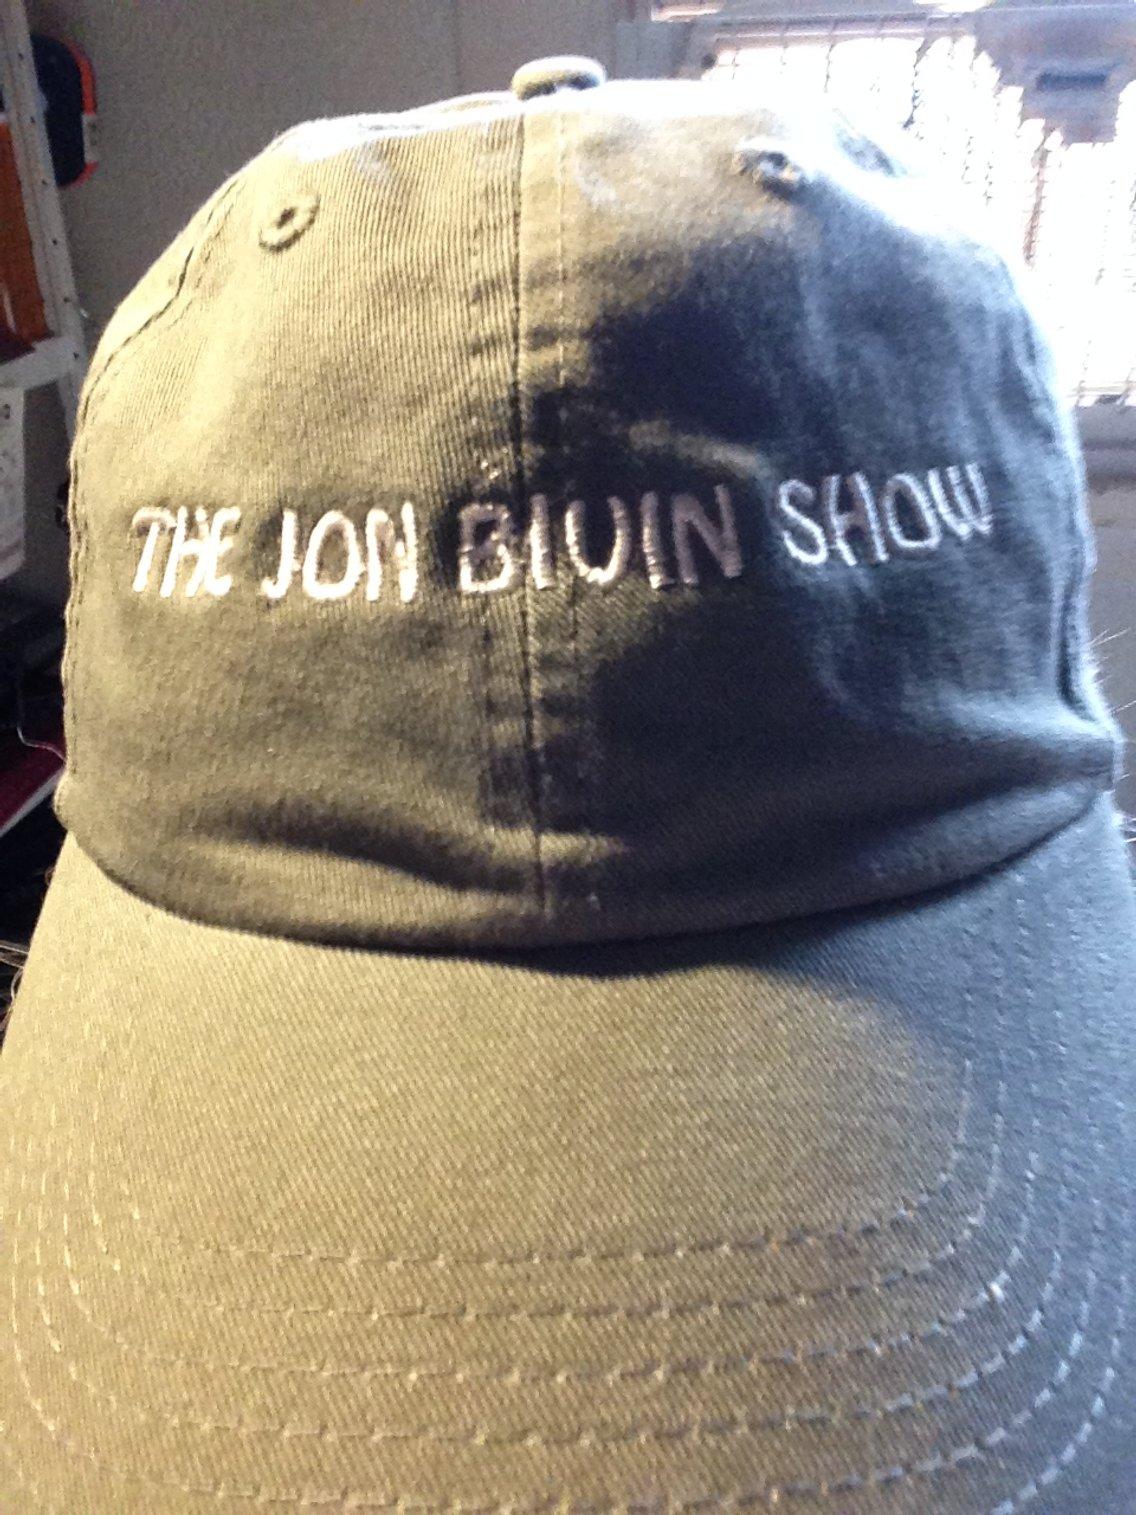 The Jon Bivin Show - Cover Image